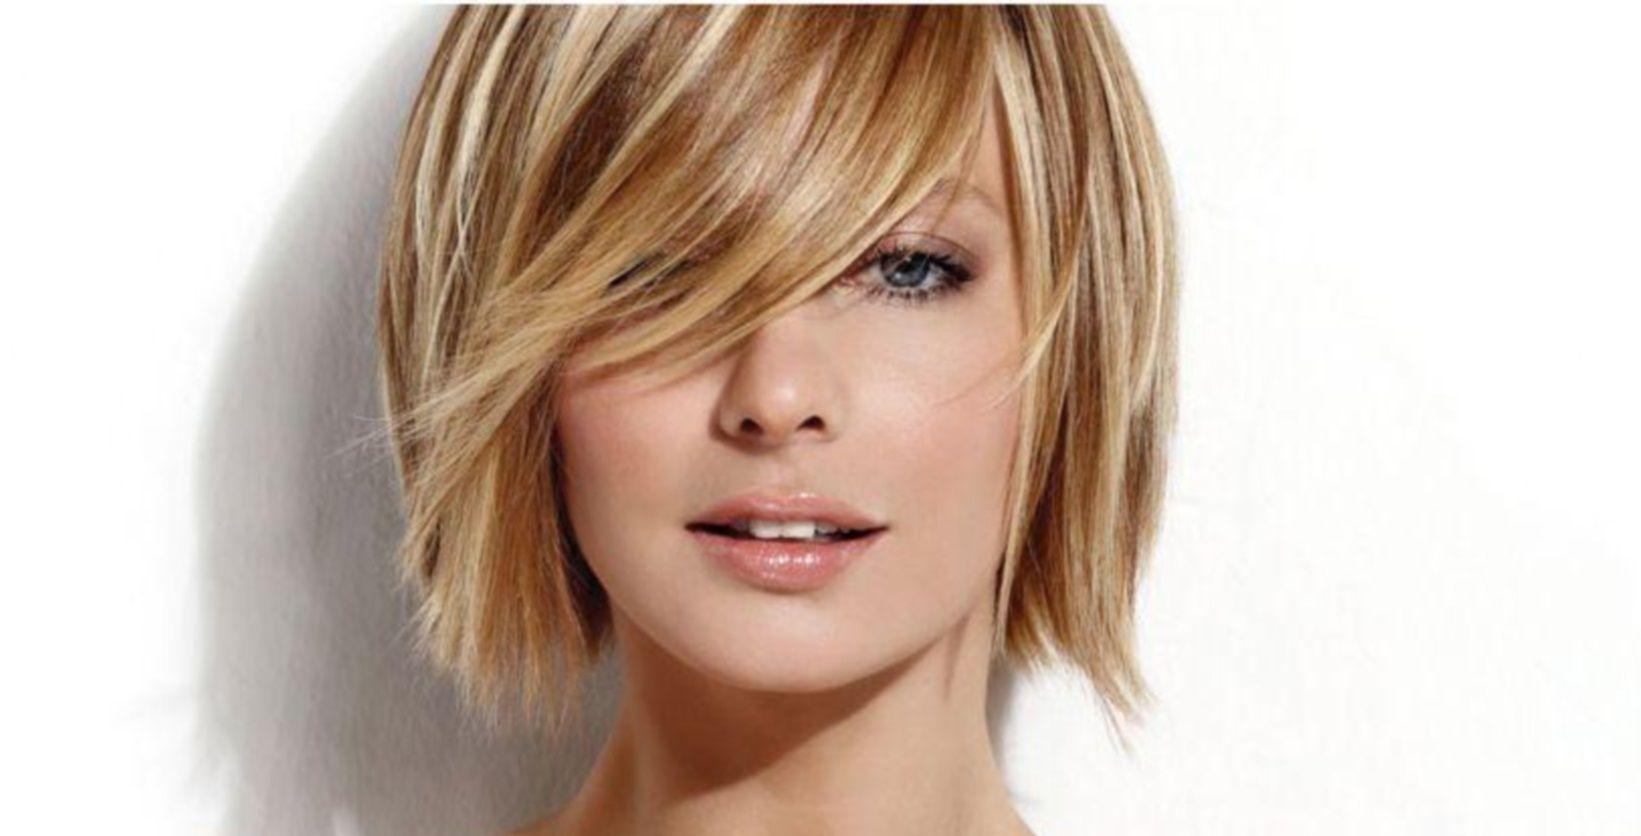 Blonde highlights edunideas beauty school pinterest